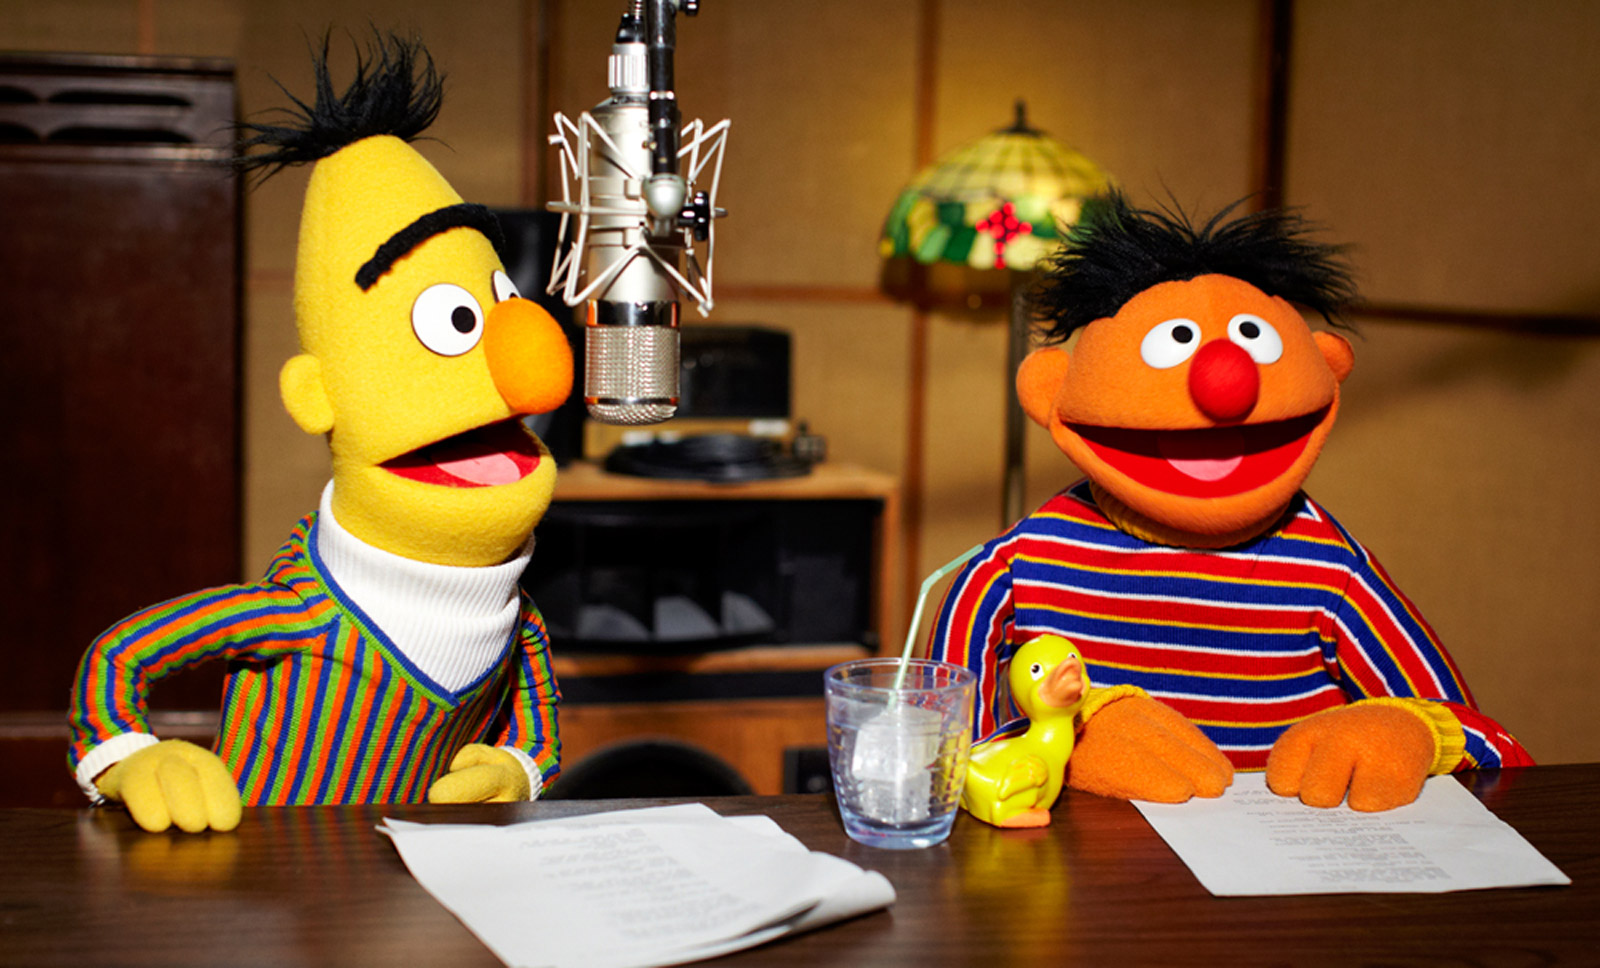 Sesame Street's Bert And Ernie Available On TomTom GPS